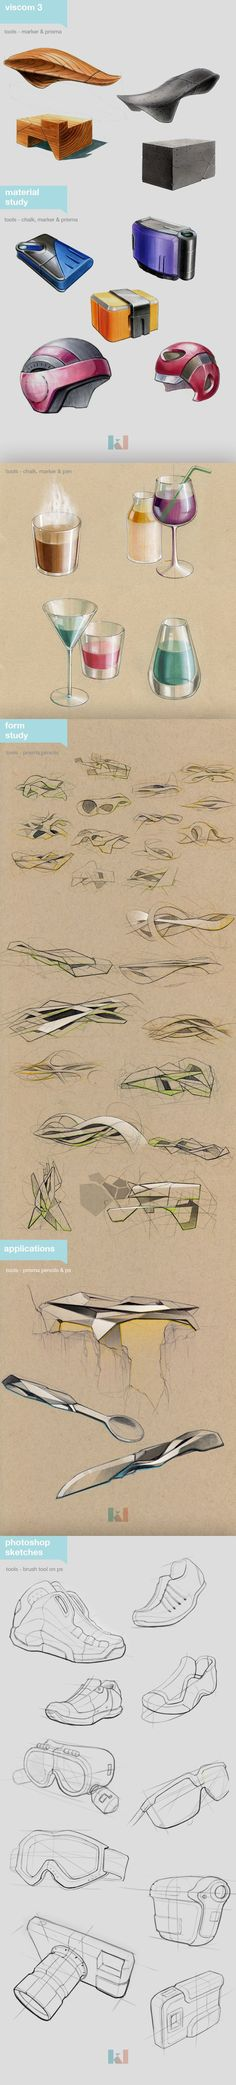 Visual communications by Kidong Kwon, via Behance